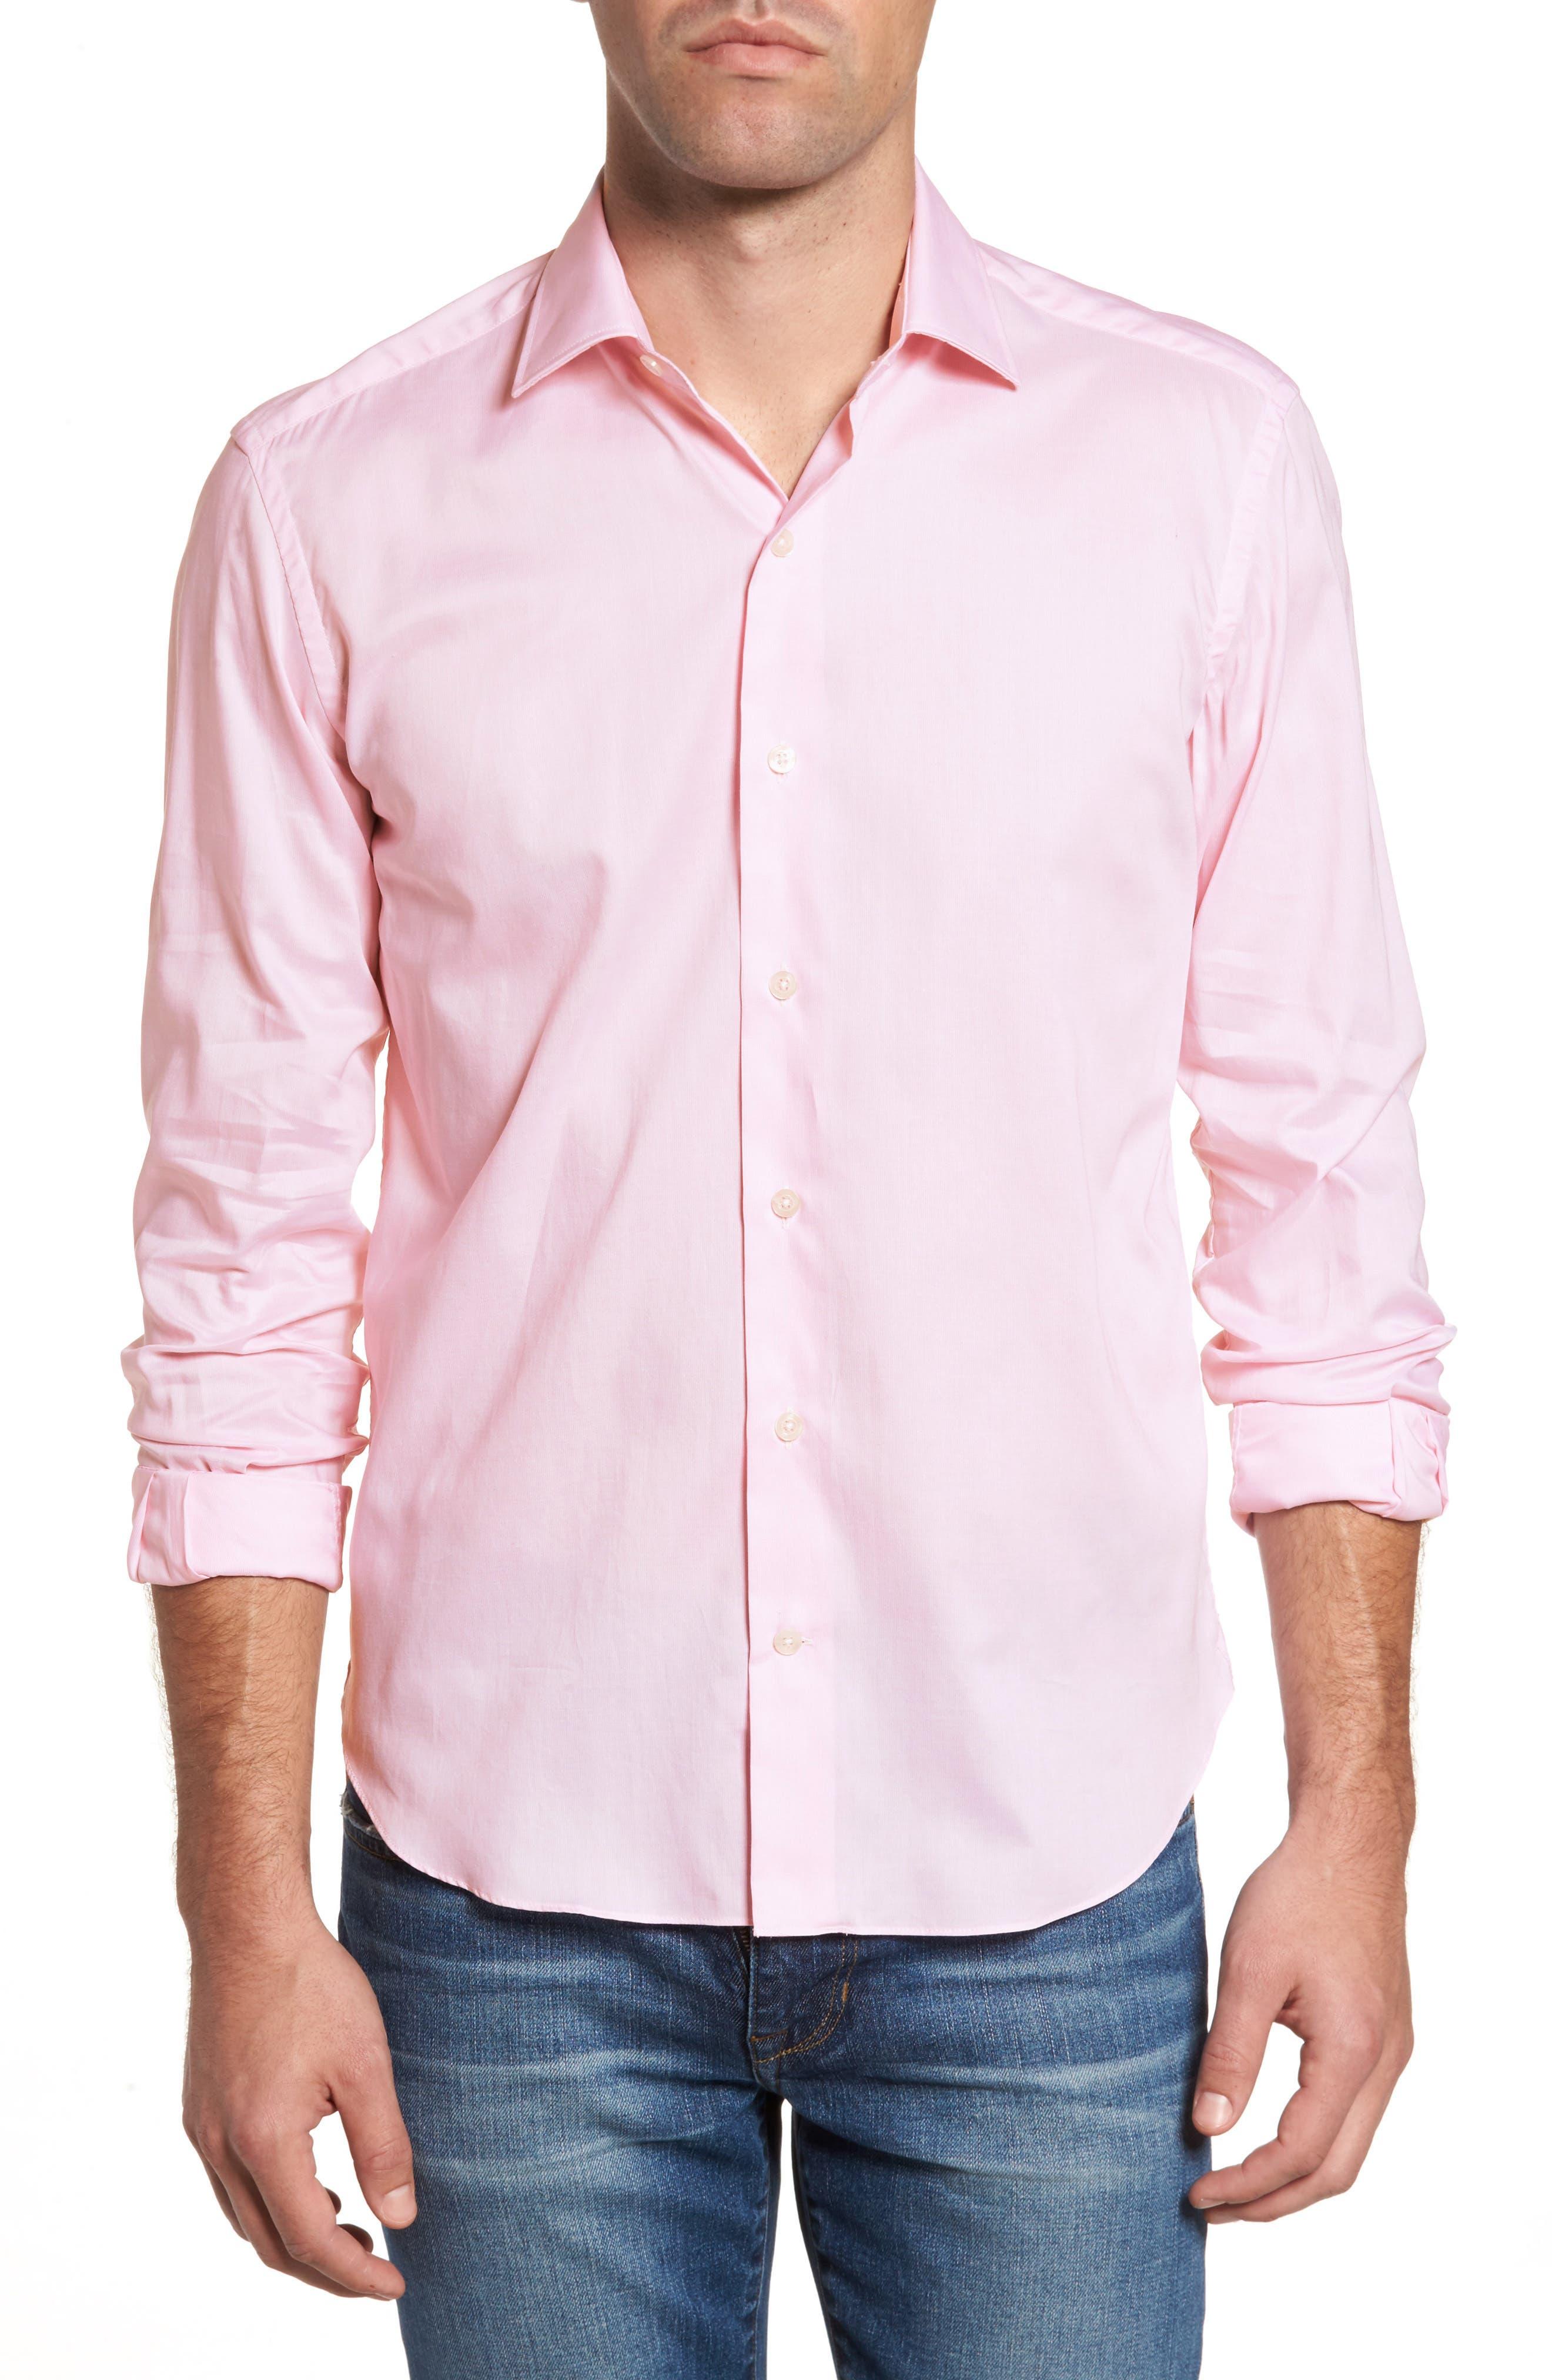 Alternate Image 1 Selected - Culturata Slim Fit Micro Stripe Sport Shirt